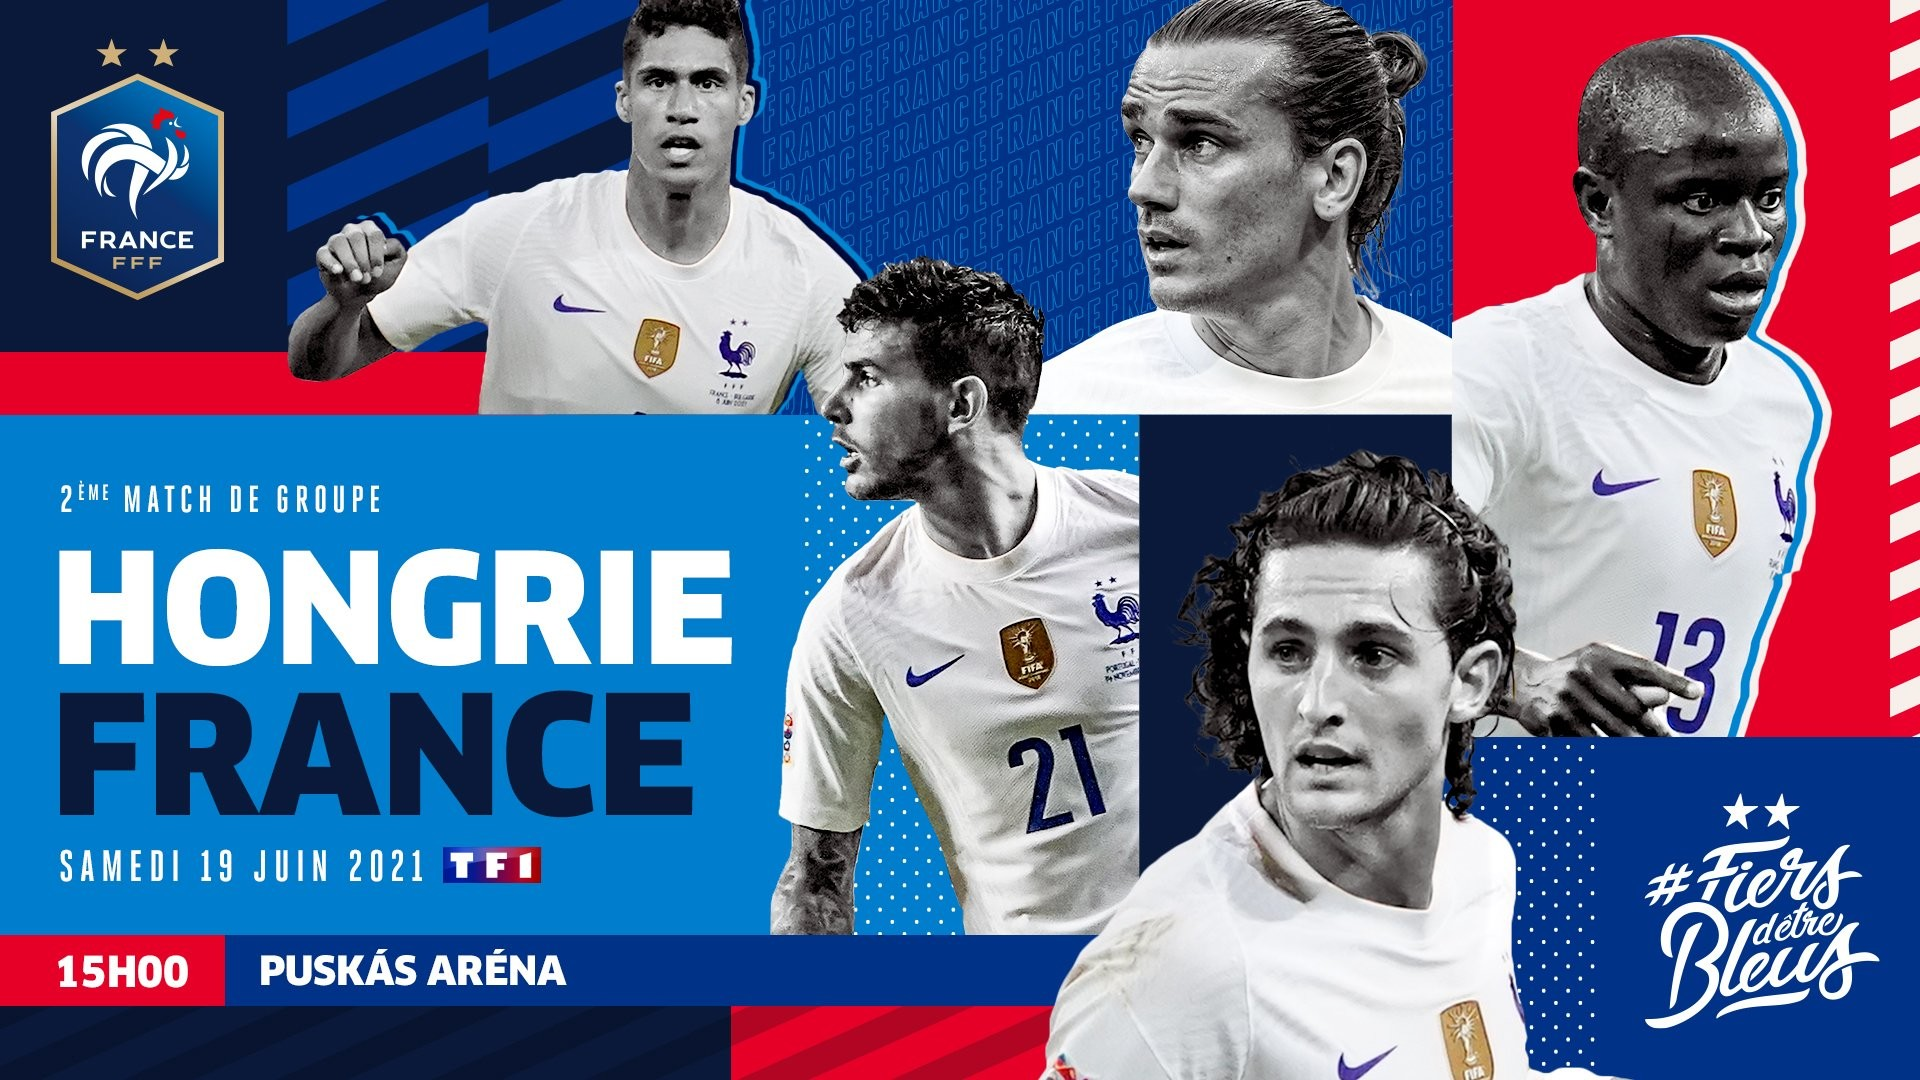 Football Euro 2020 – Hongrie France – TF1